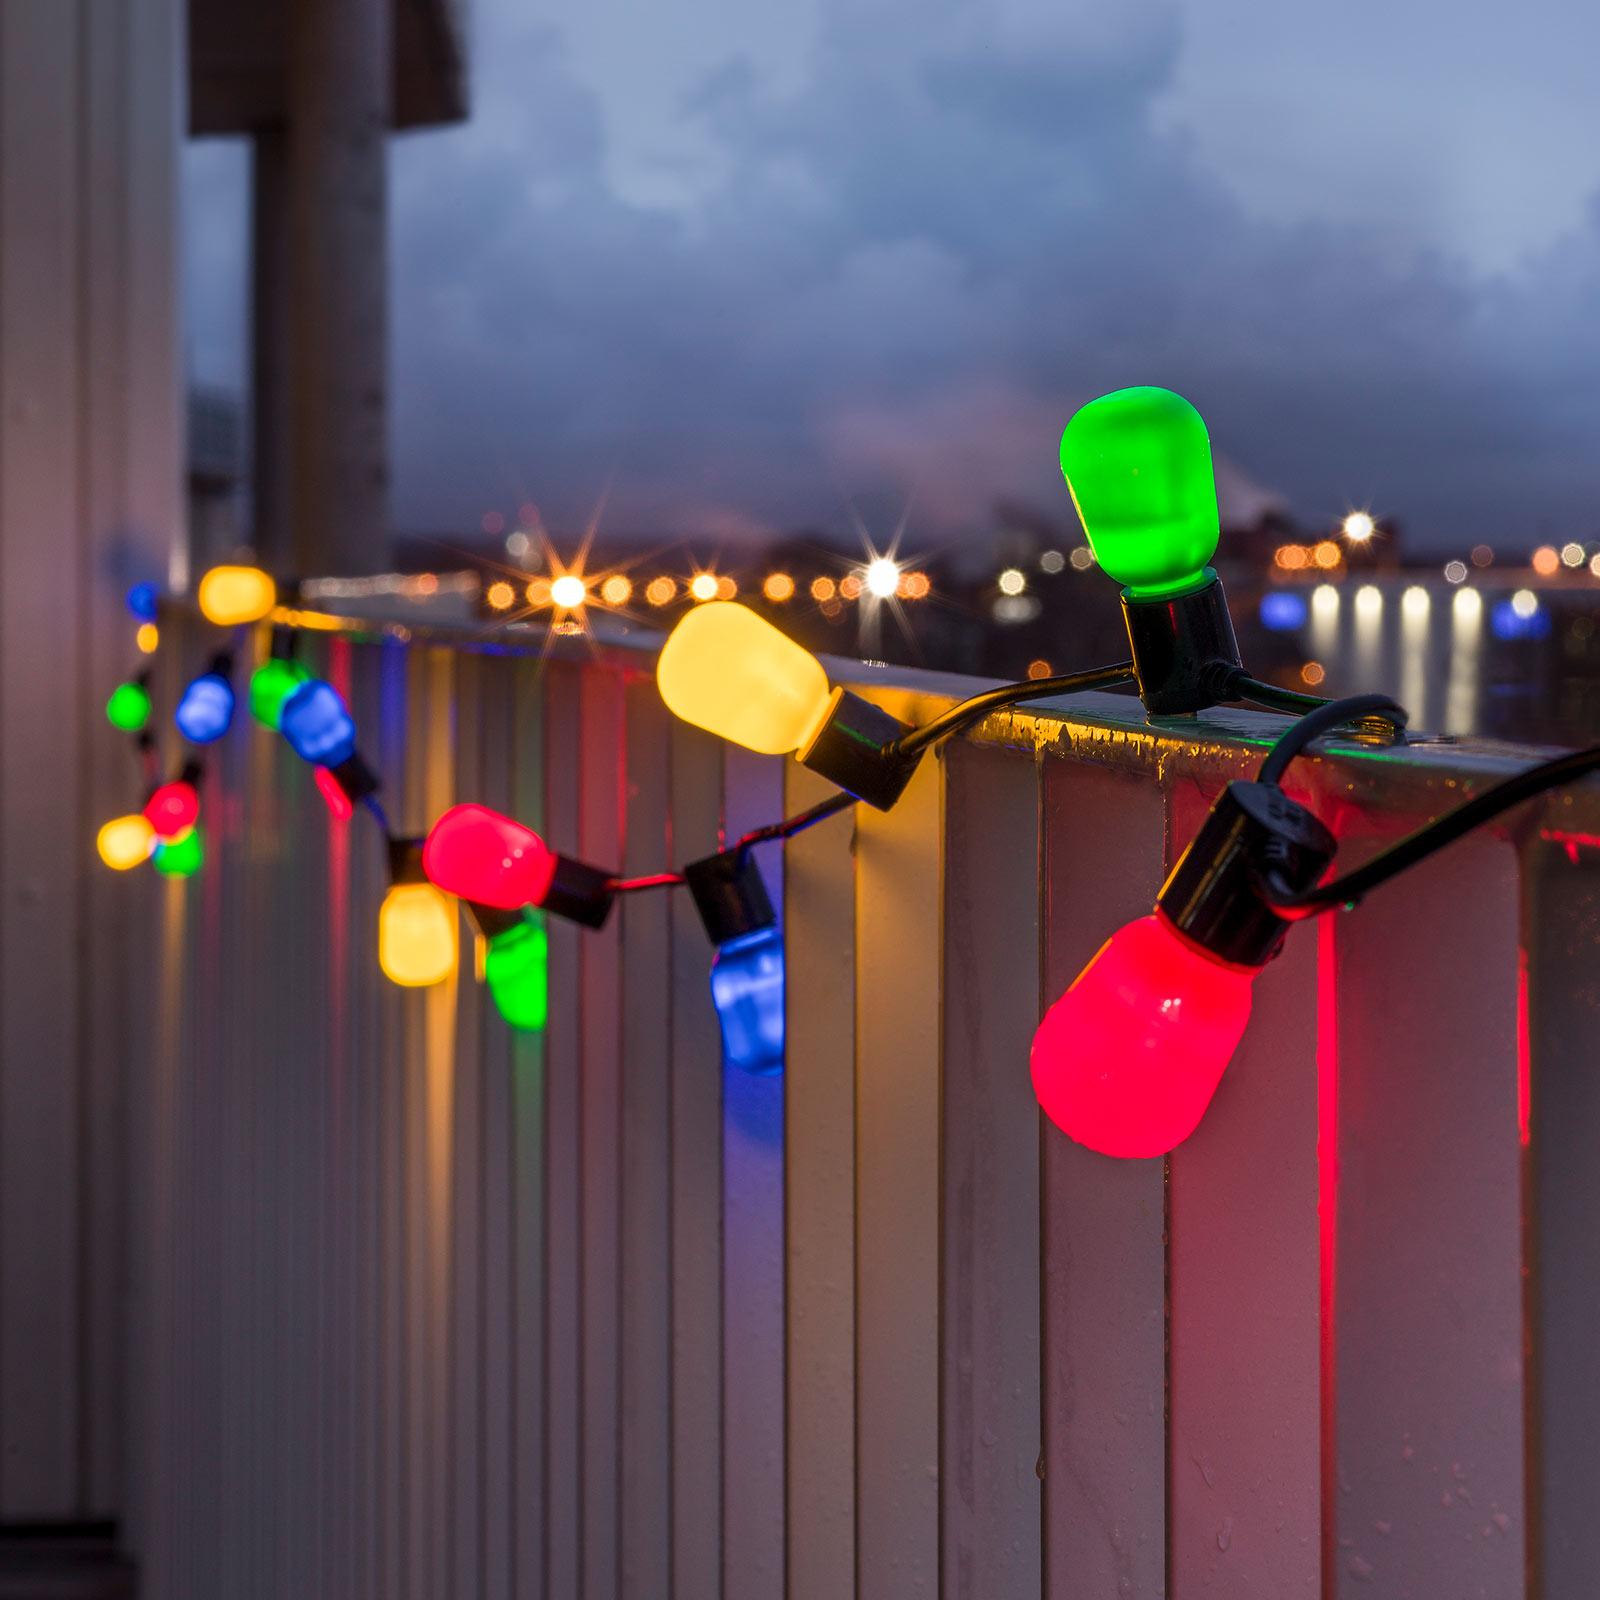 Lichtk Biergarten 40 LED druppels kleurrijk, opa